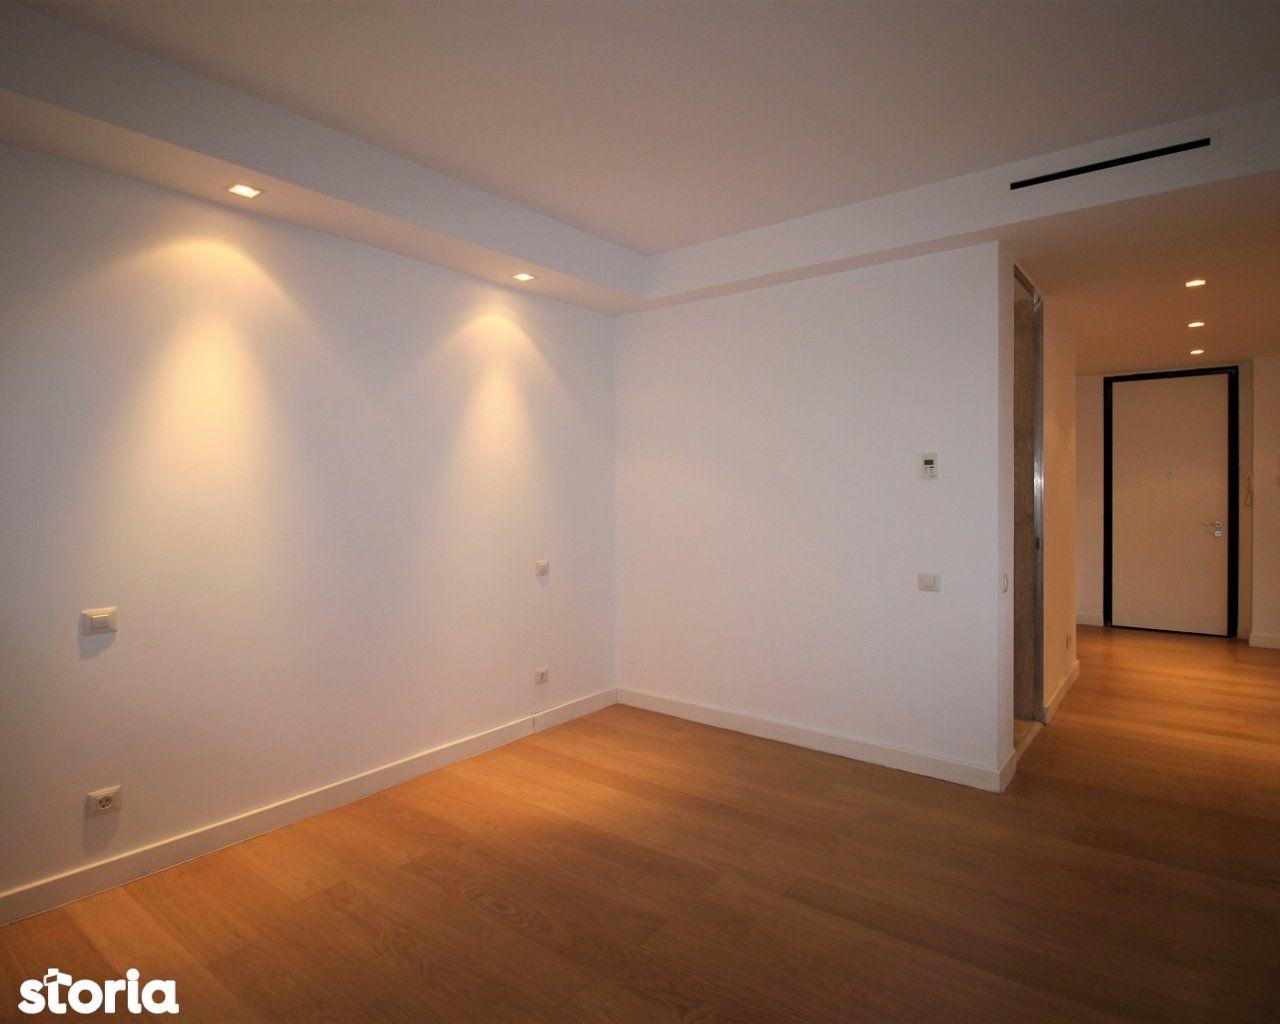 Apartament de vanzare, București (judet), Strada Sfinții Voievozi - Foto 10